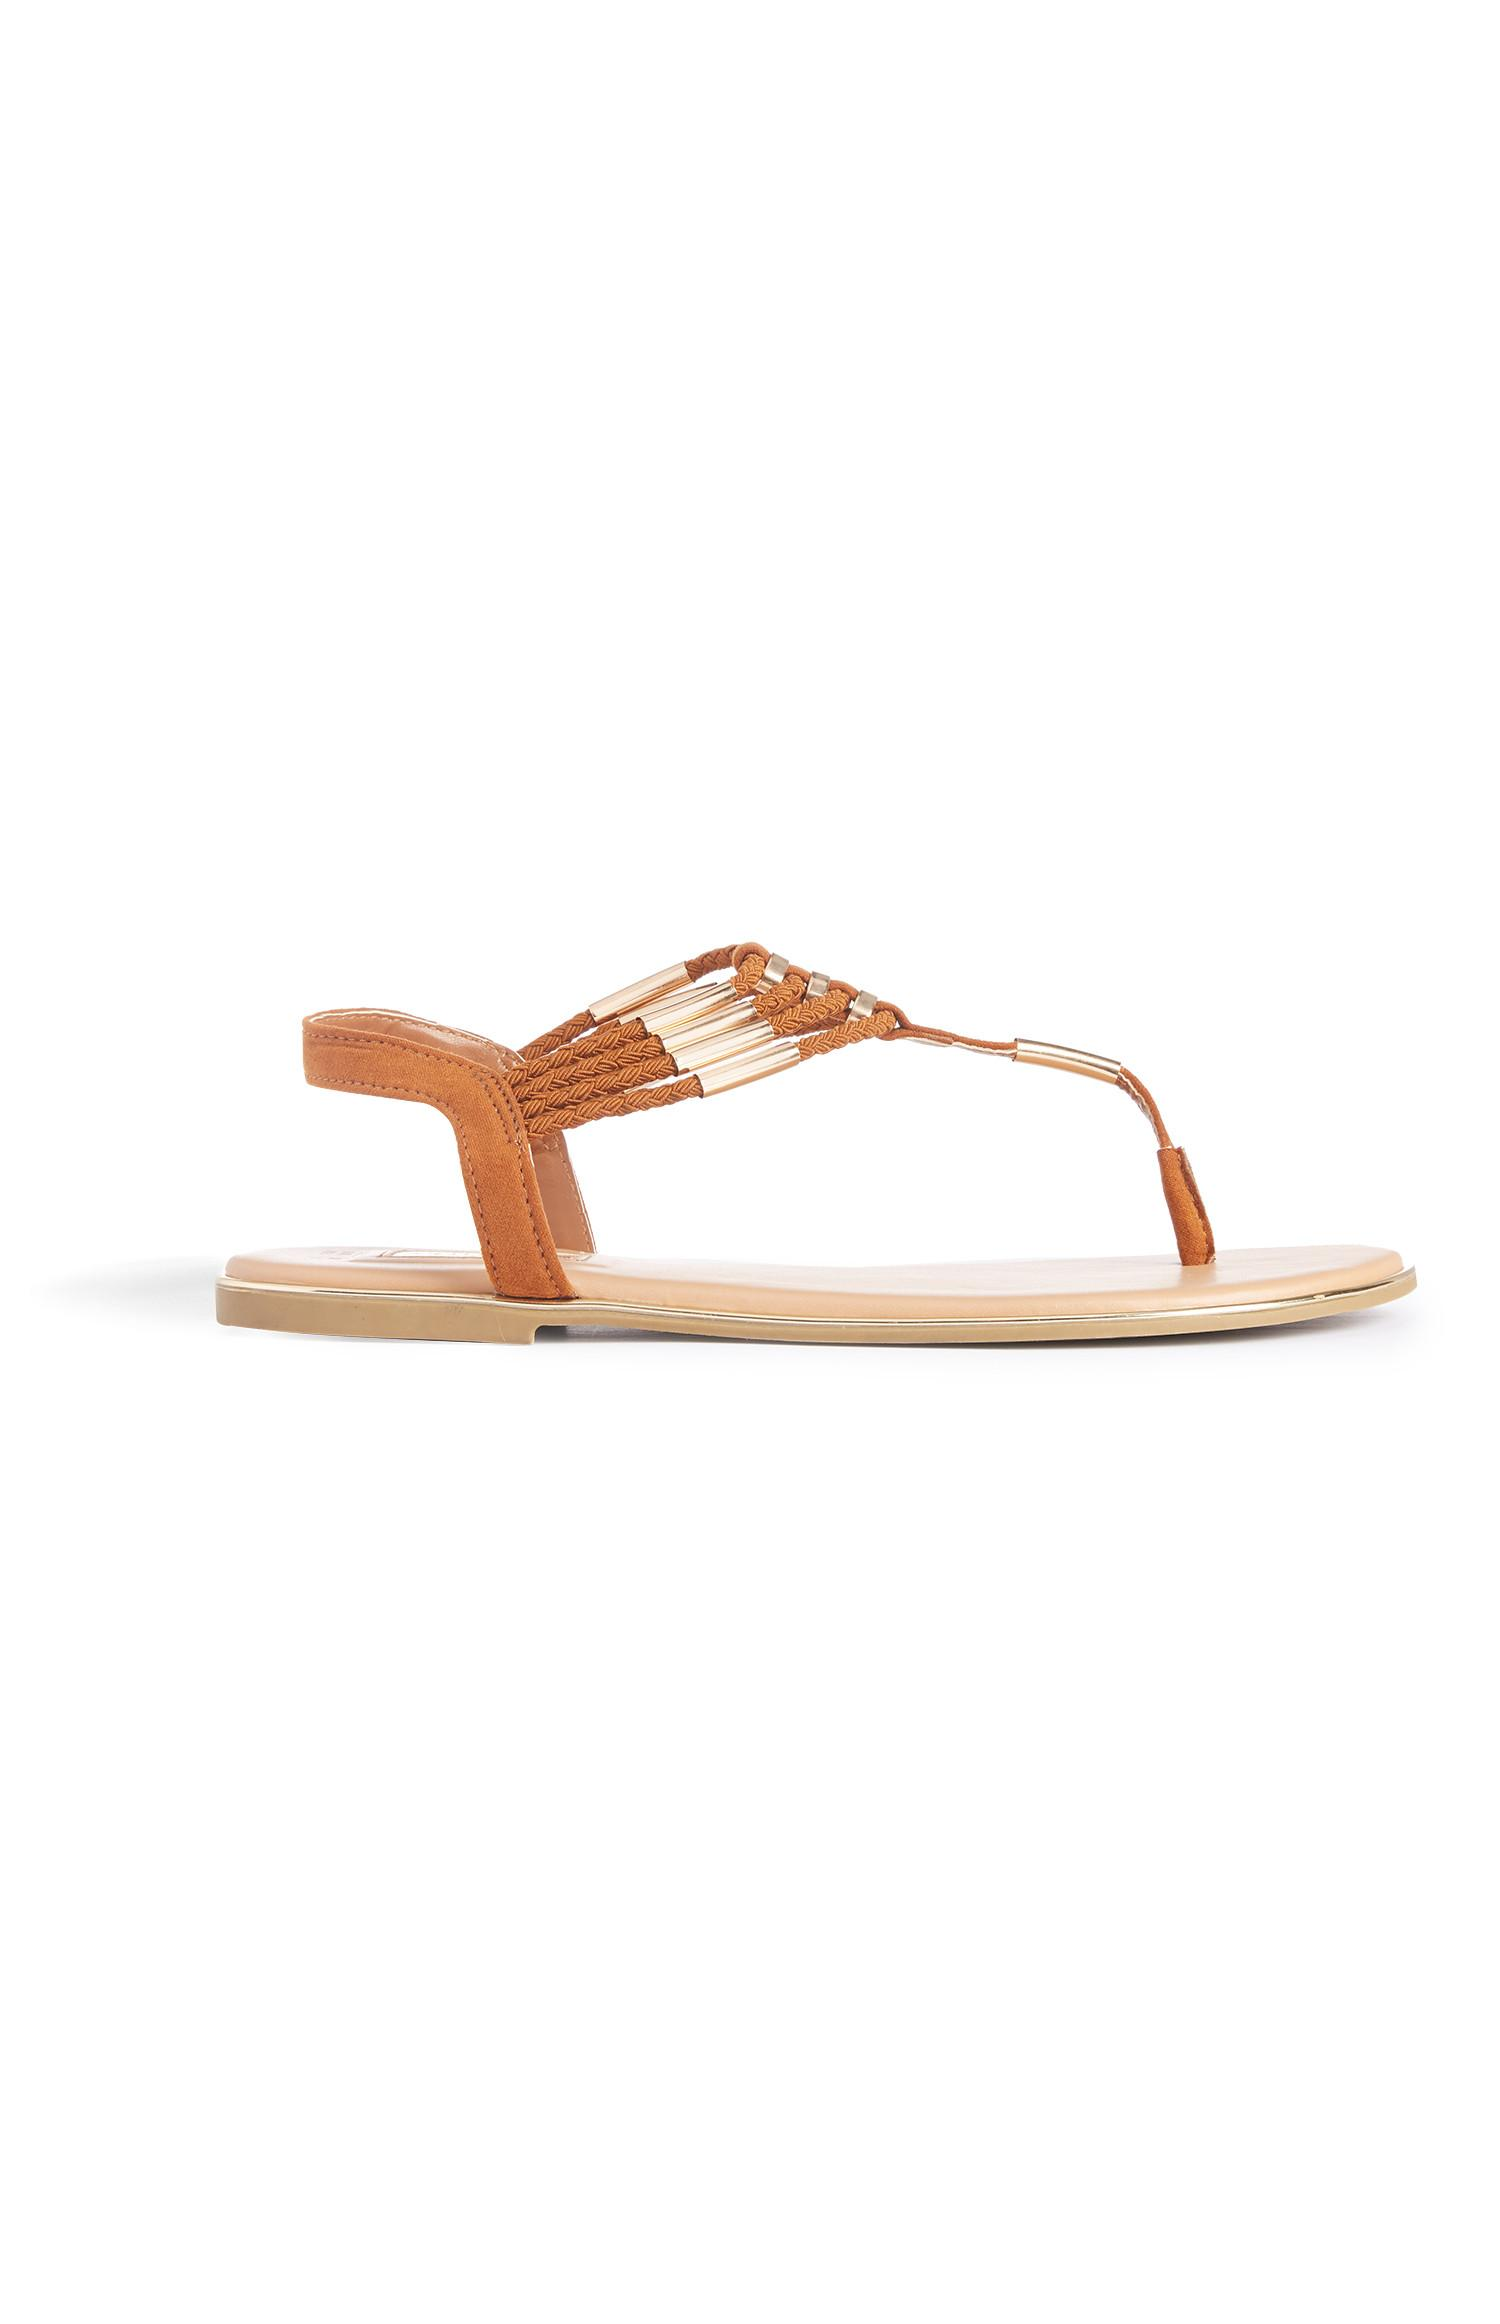 Tan Beaded Sandal